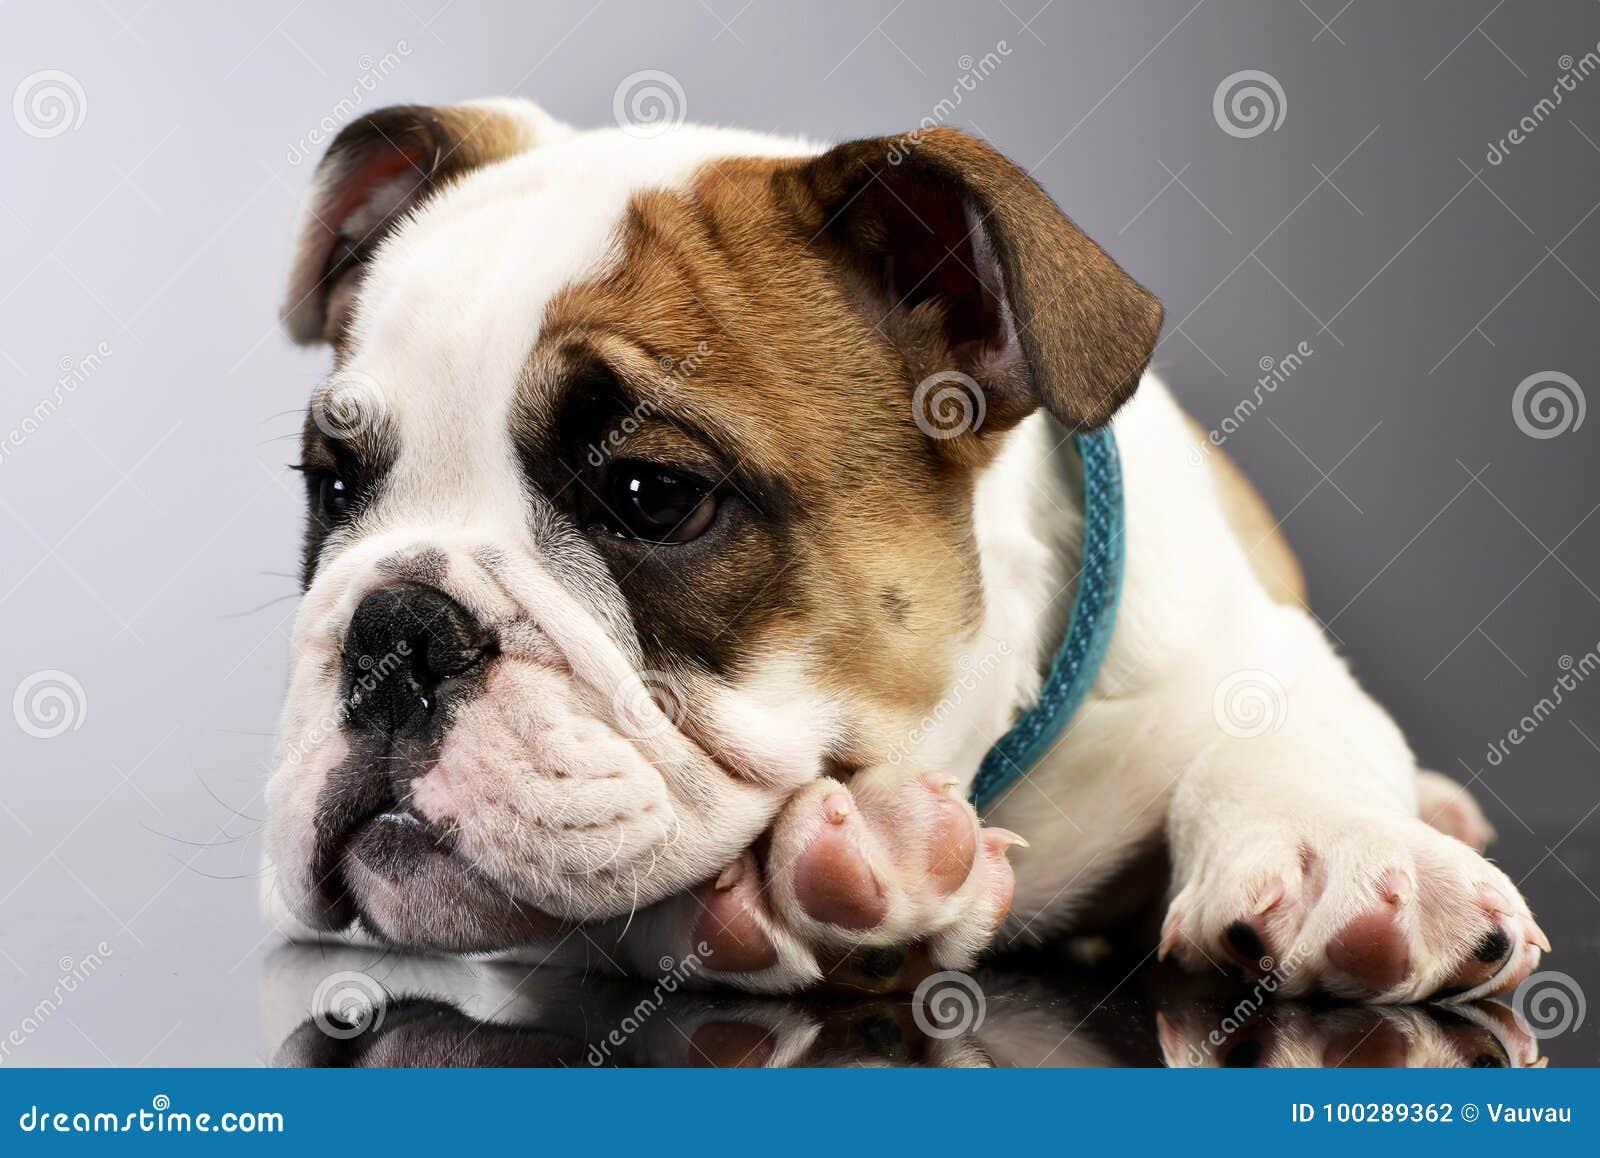 Studio Shot Of An Adorable English Bulldog Puppy Stock Photo Image Of Mouth English 100289362